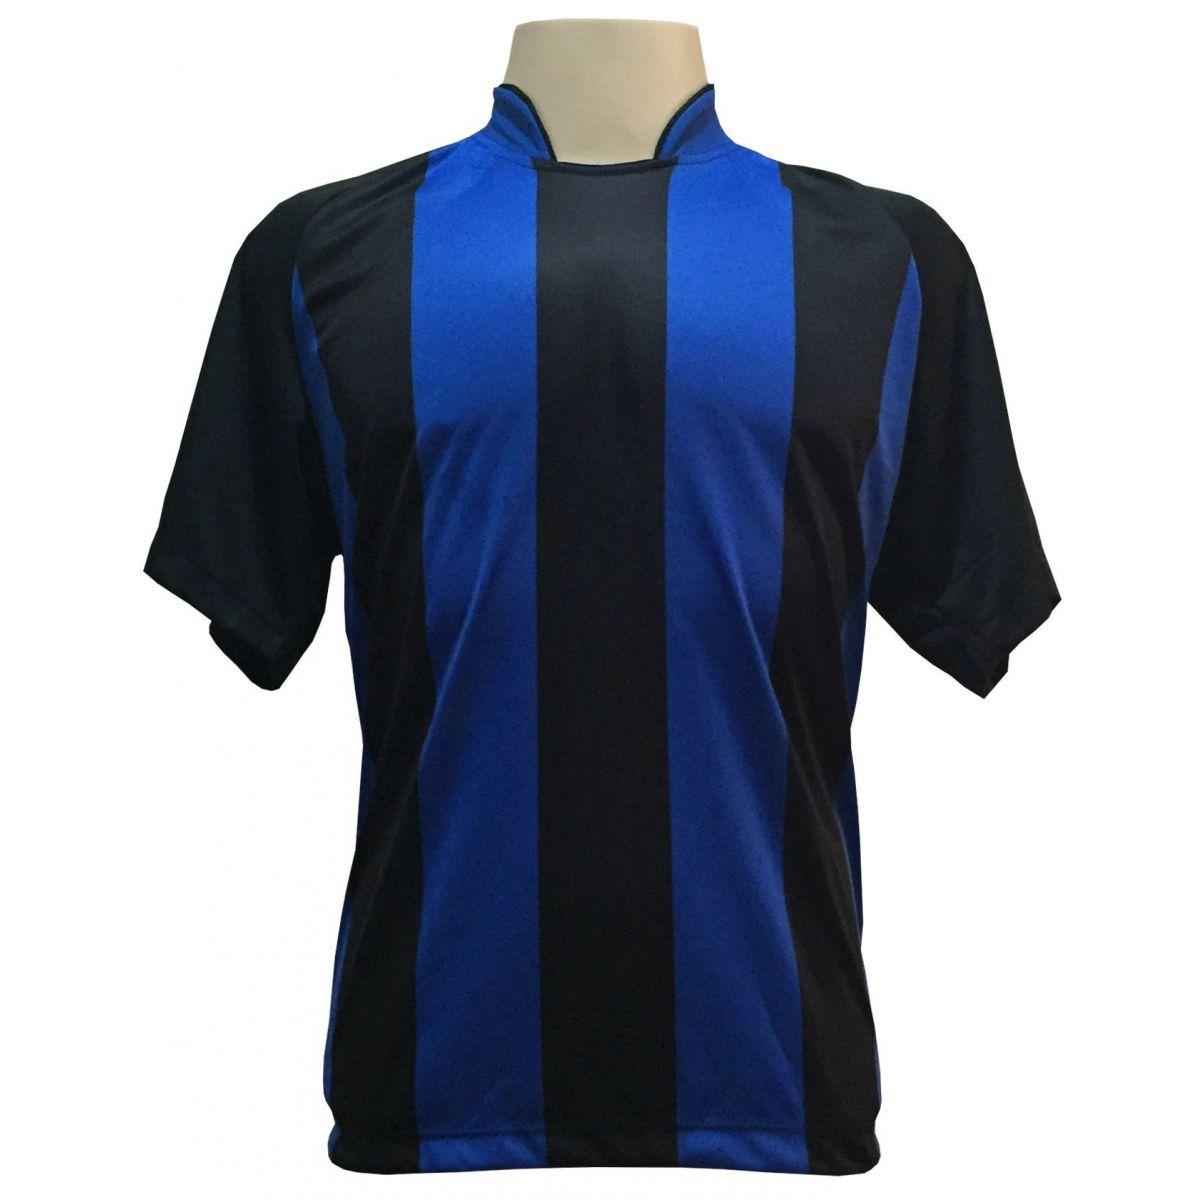 Jogo de Camisa com 18 unidades modelo Milan Preto/Royal + Brindes